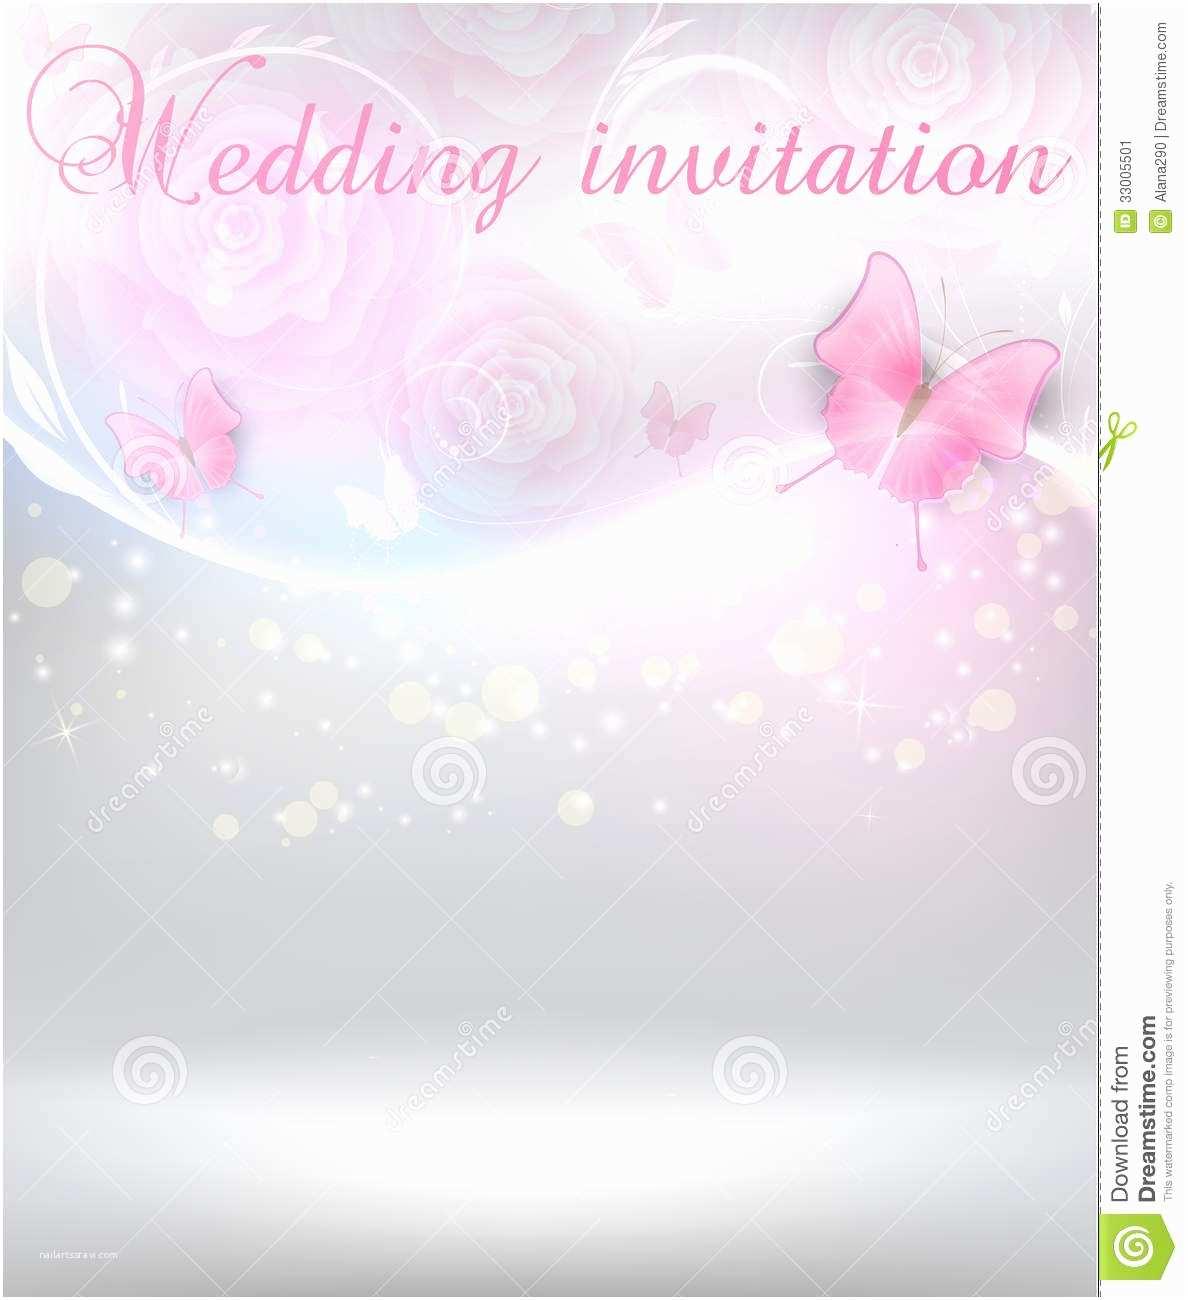 Wedding Invitation Pictures  Wedding Invitation